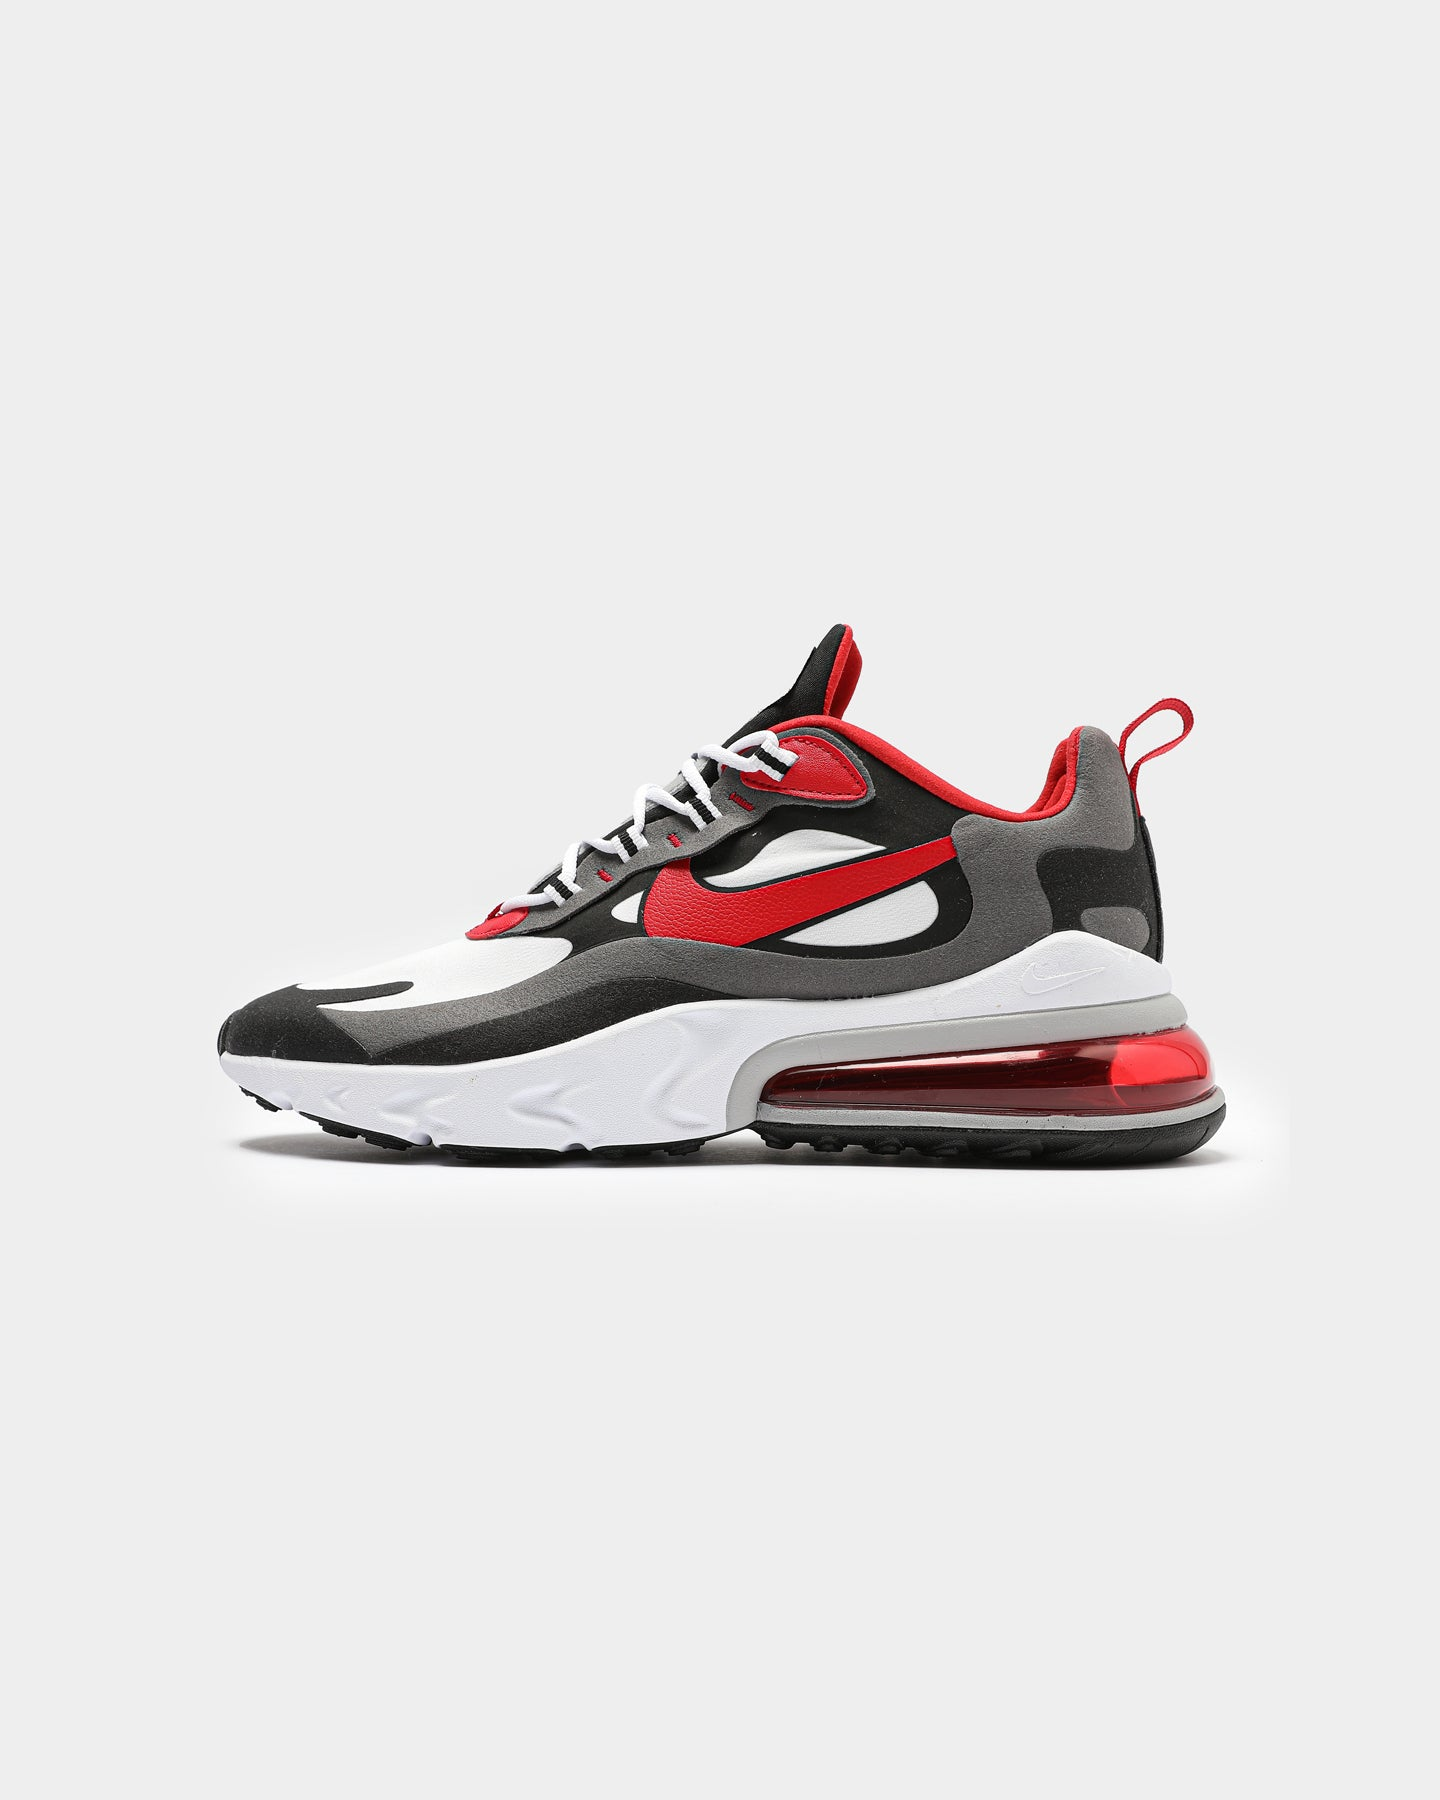 Nike Air Max 270 React BlackRedWhite